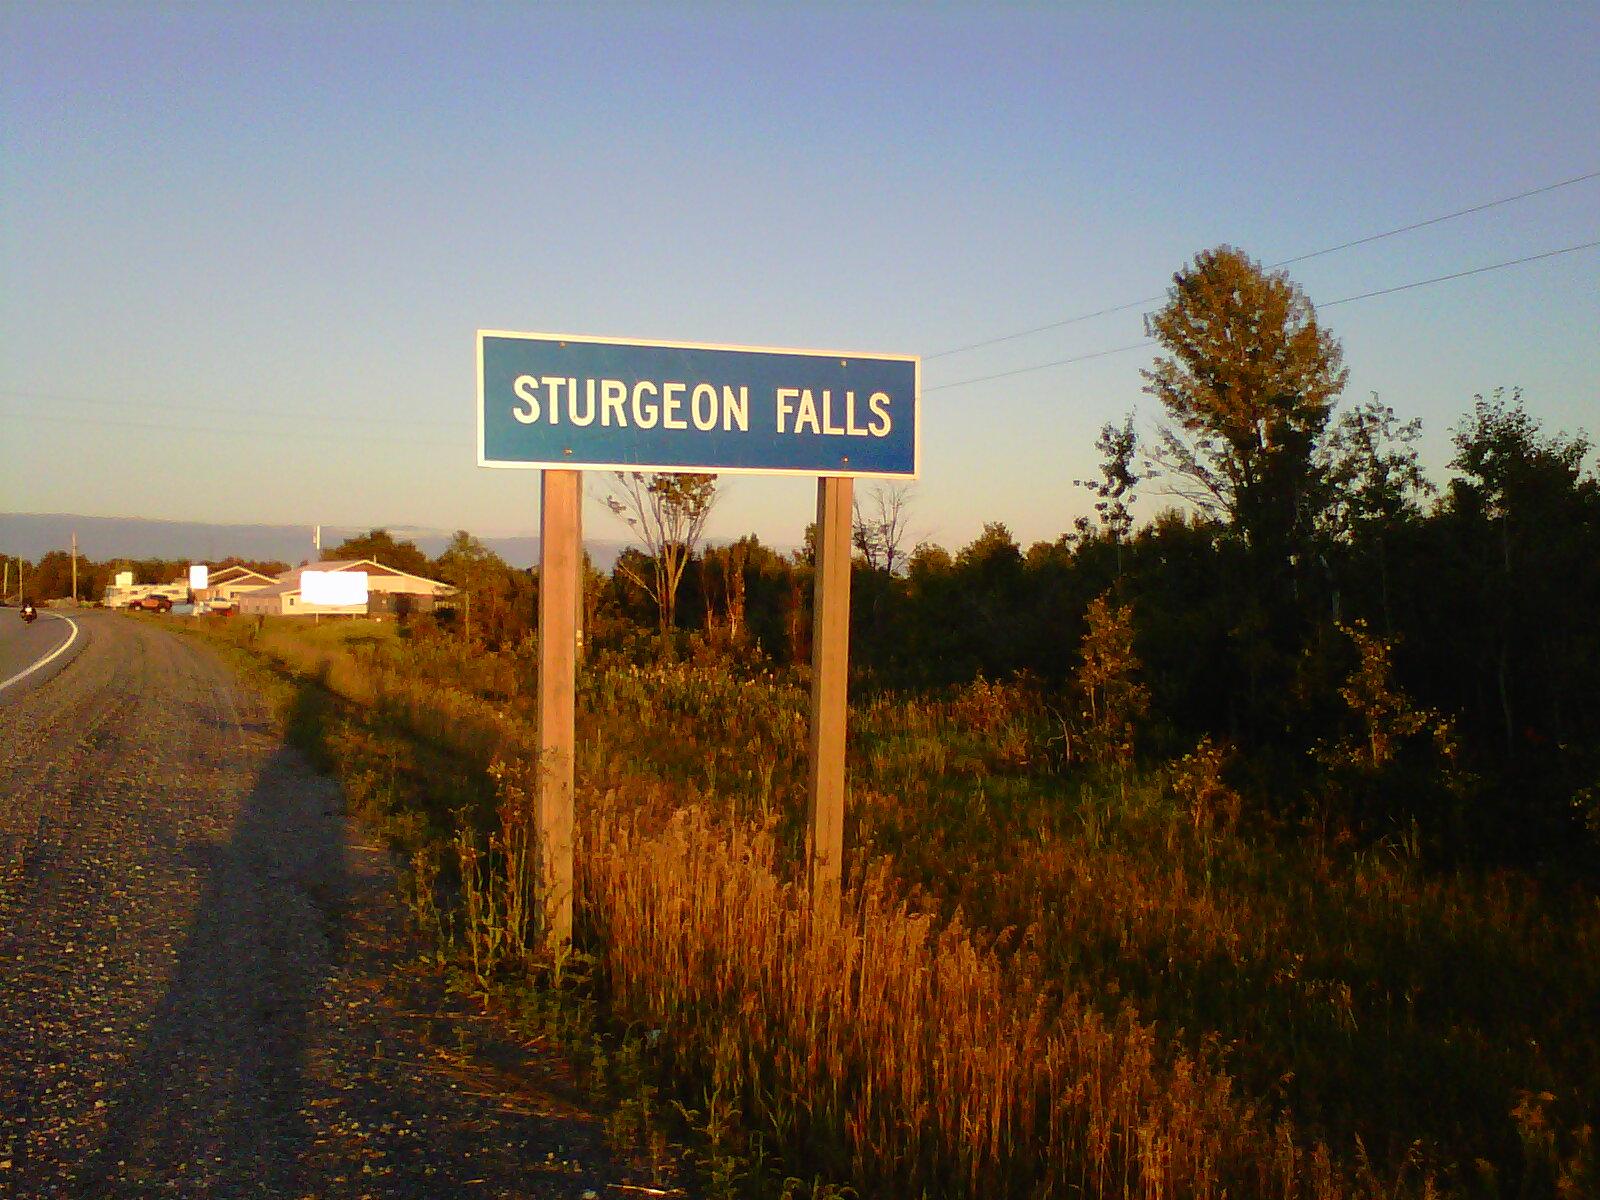 Sturgeon Falls (ON) Canada  city images : GO Jean Canada!: NOUVELLES DE STURGEON FALLS, WEST NIPISSING, ON.